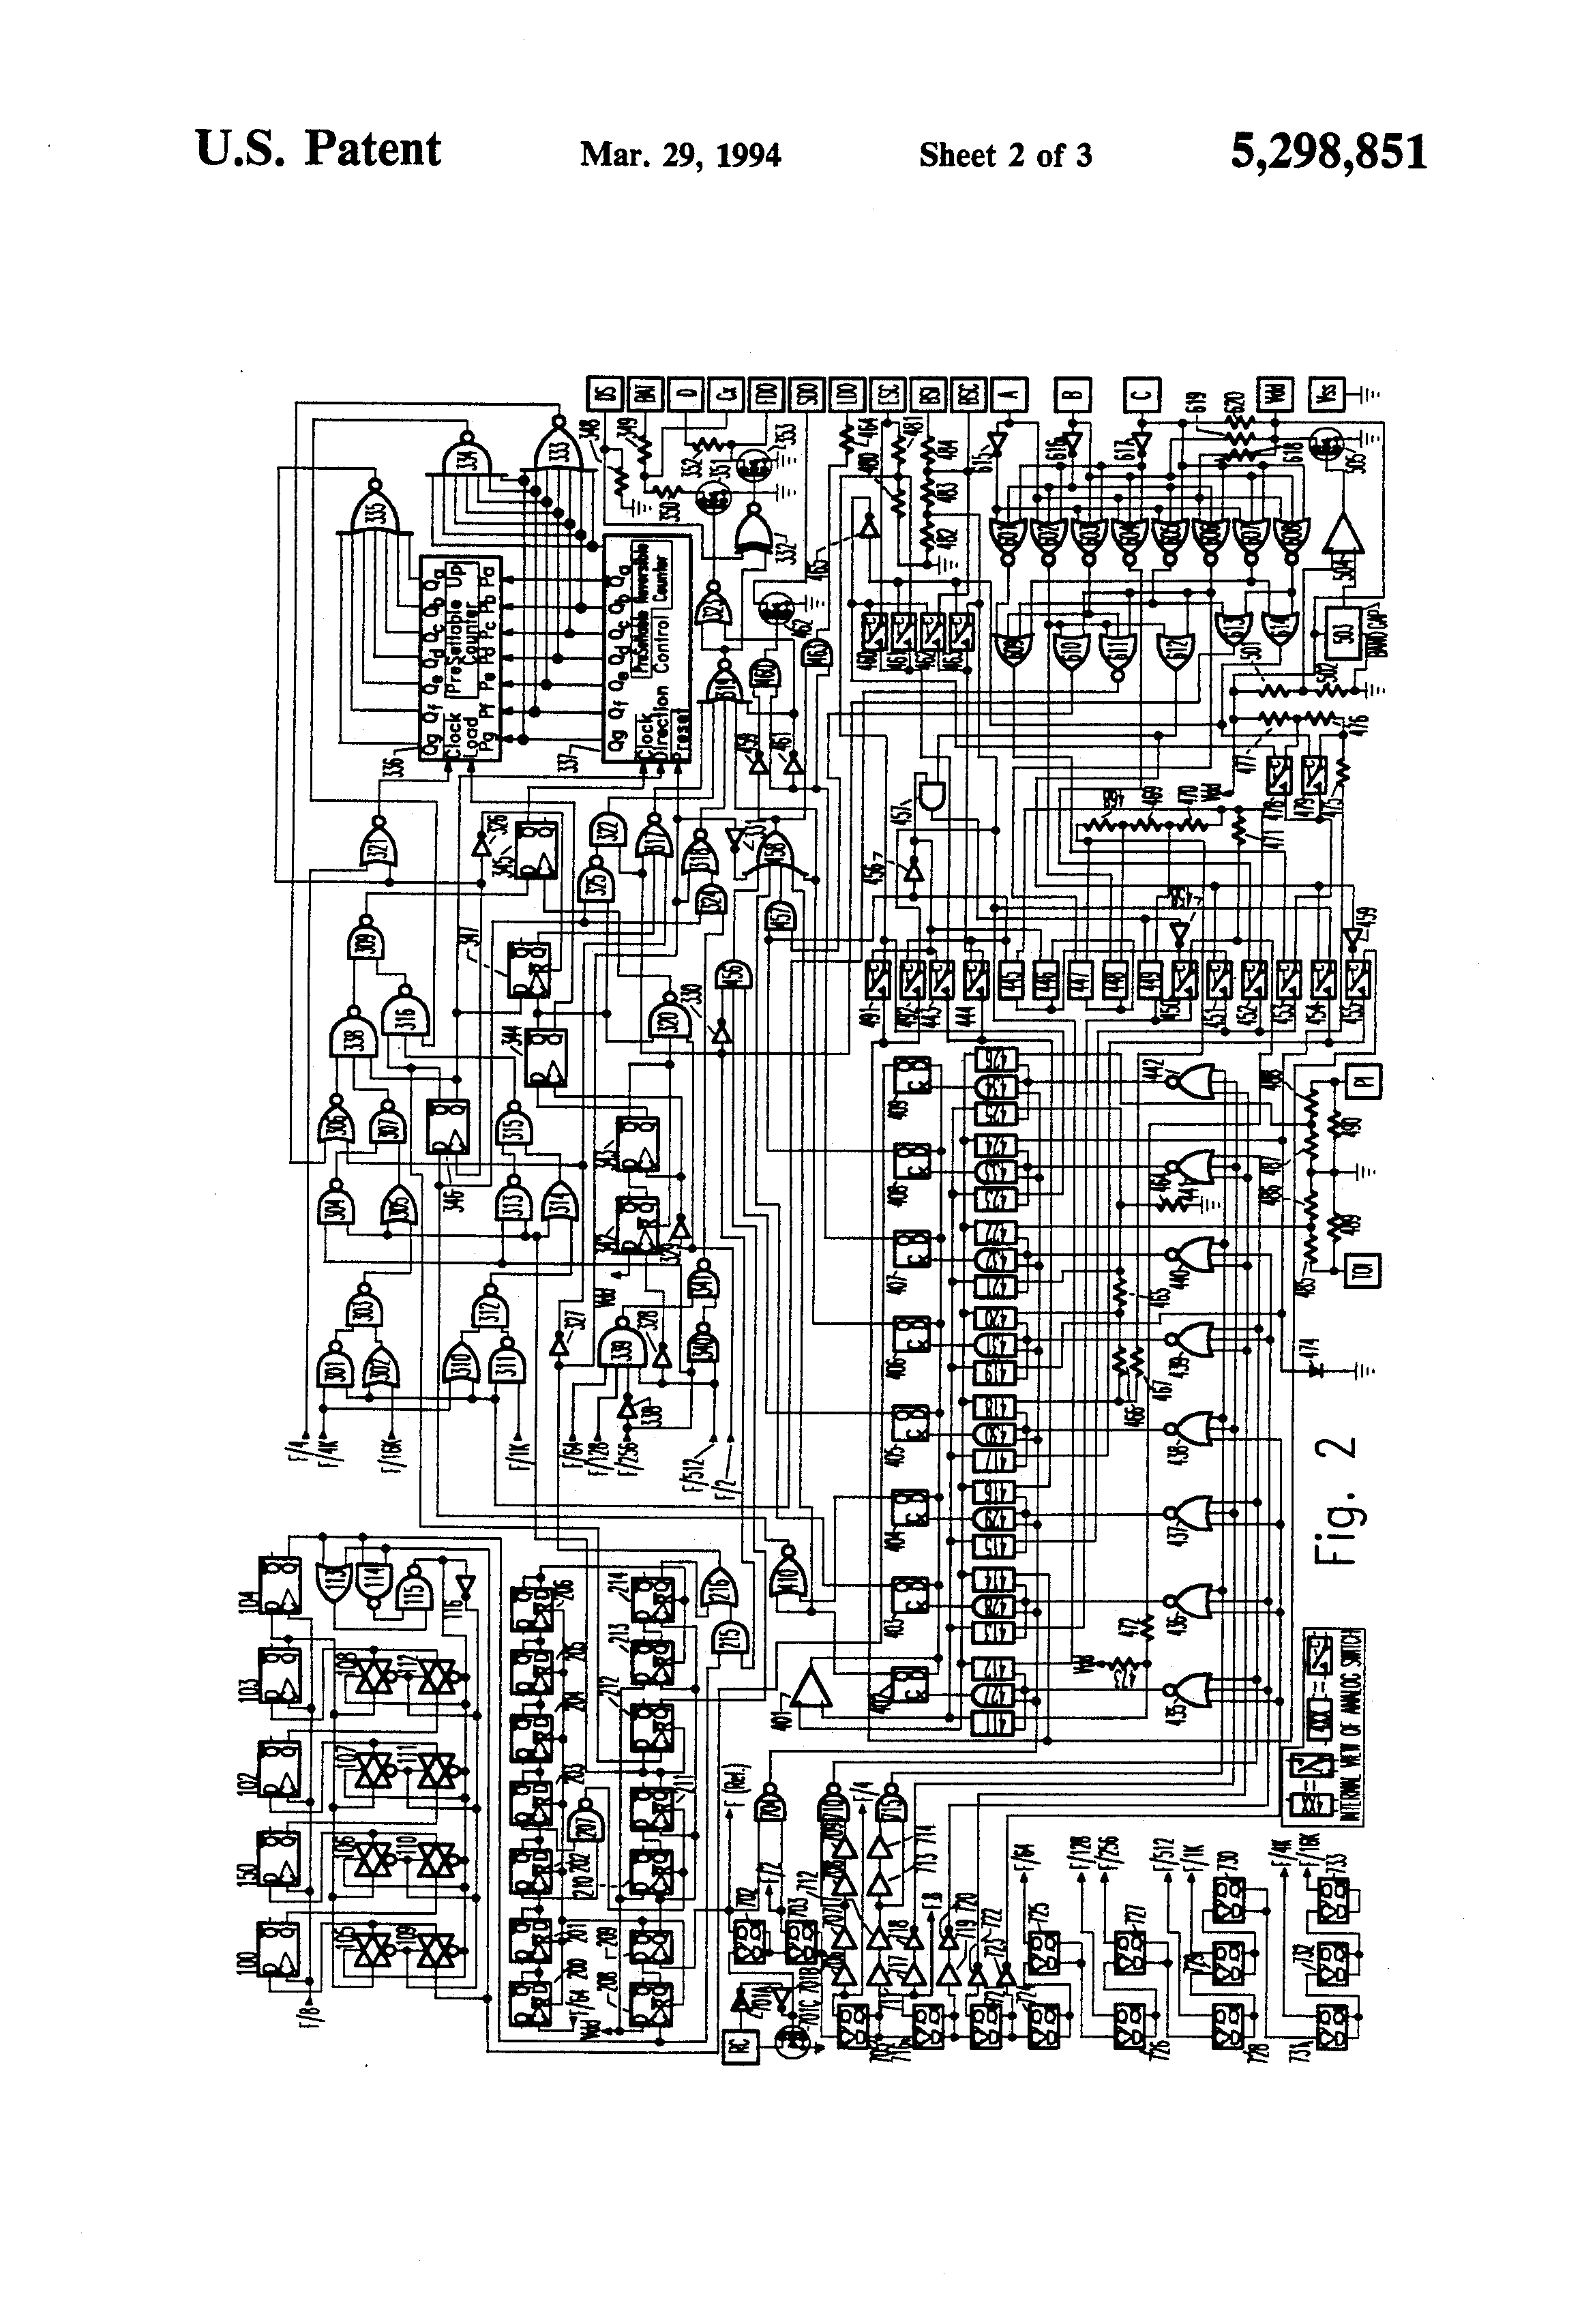 Transpo Voltage Regulator Wiring Diagram 76 Jeep Cj5 Schematic Patent Us5298851 Multiple Application System Andtranspo 15